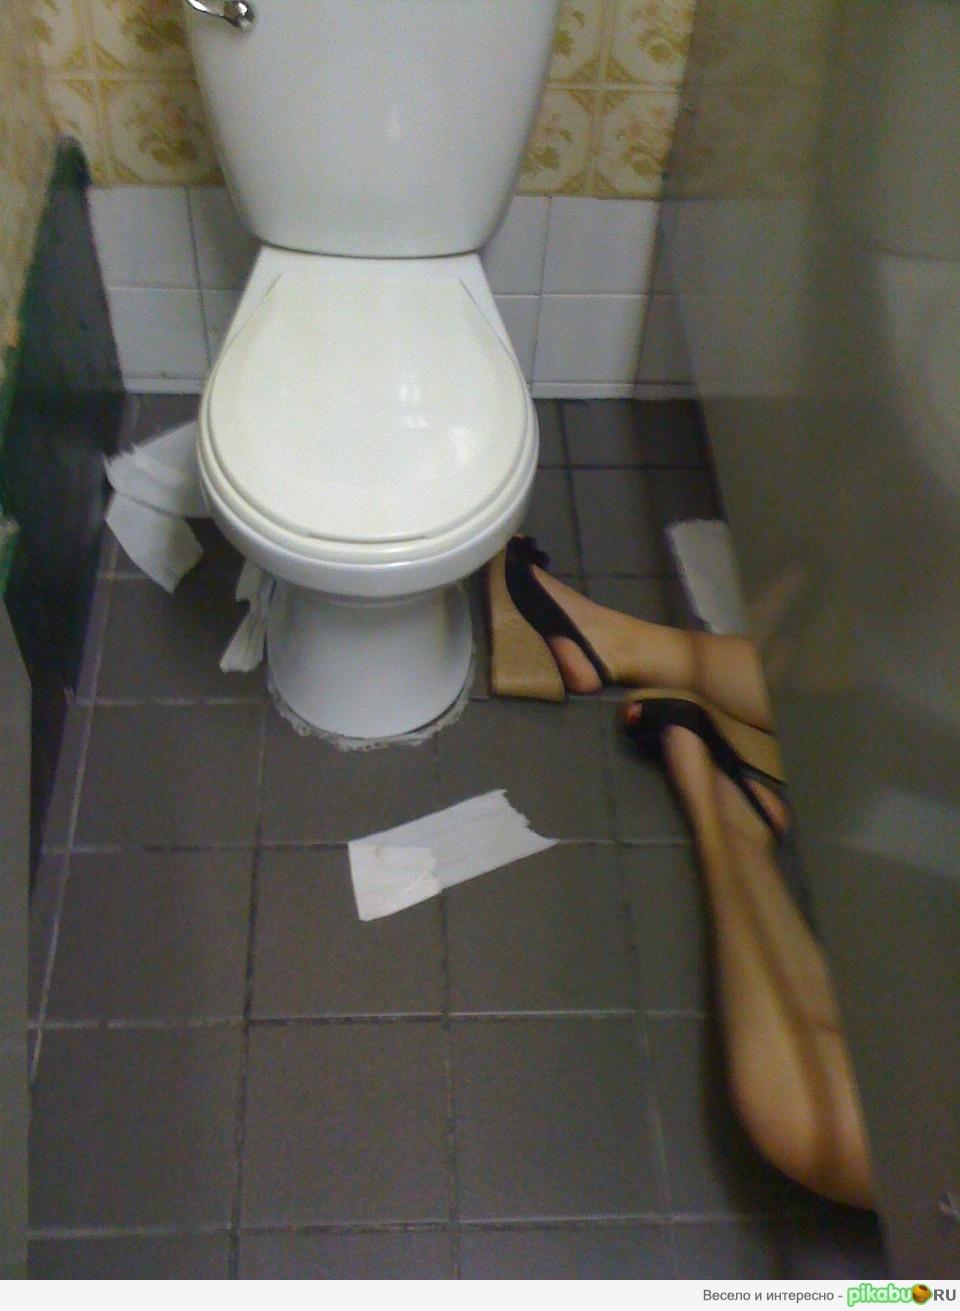 Приколи в туалети 10 фотография